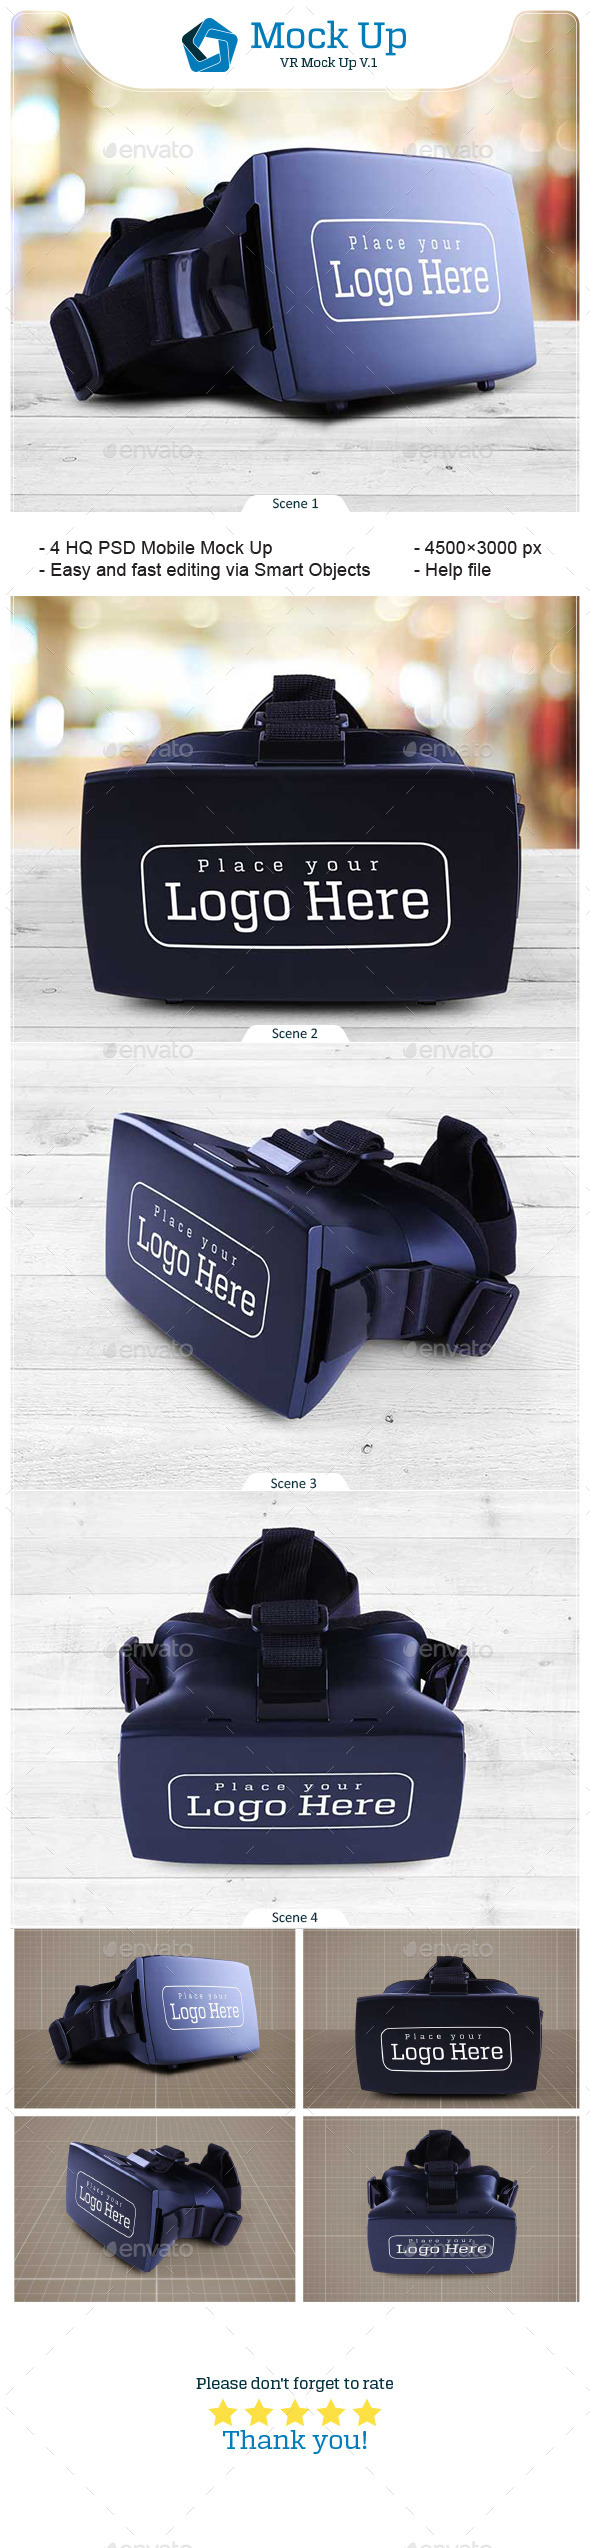 VR Mock Up V.1 - Miscellaneous Product Mock-Ups